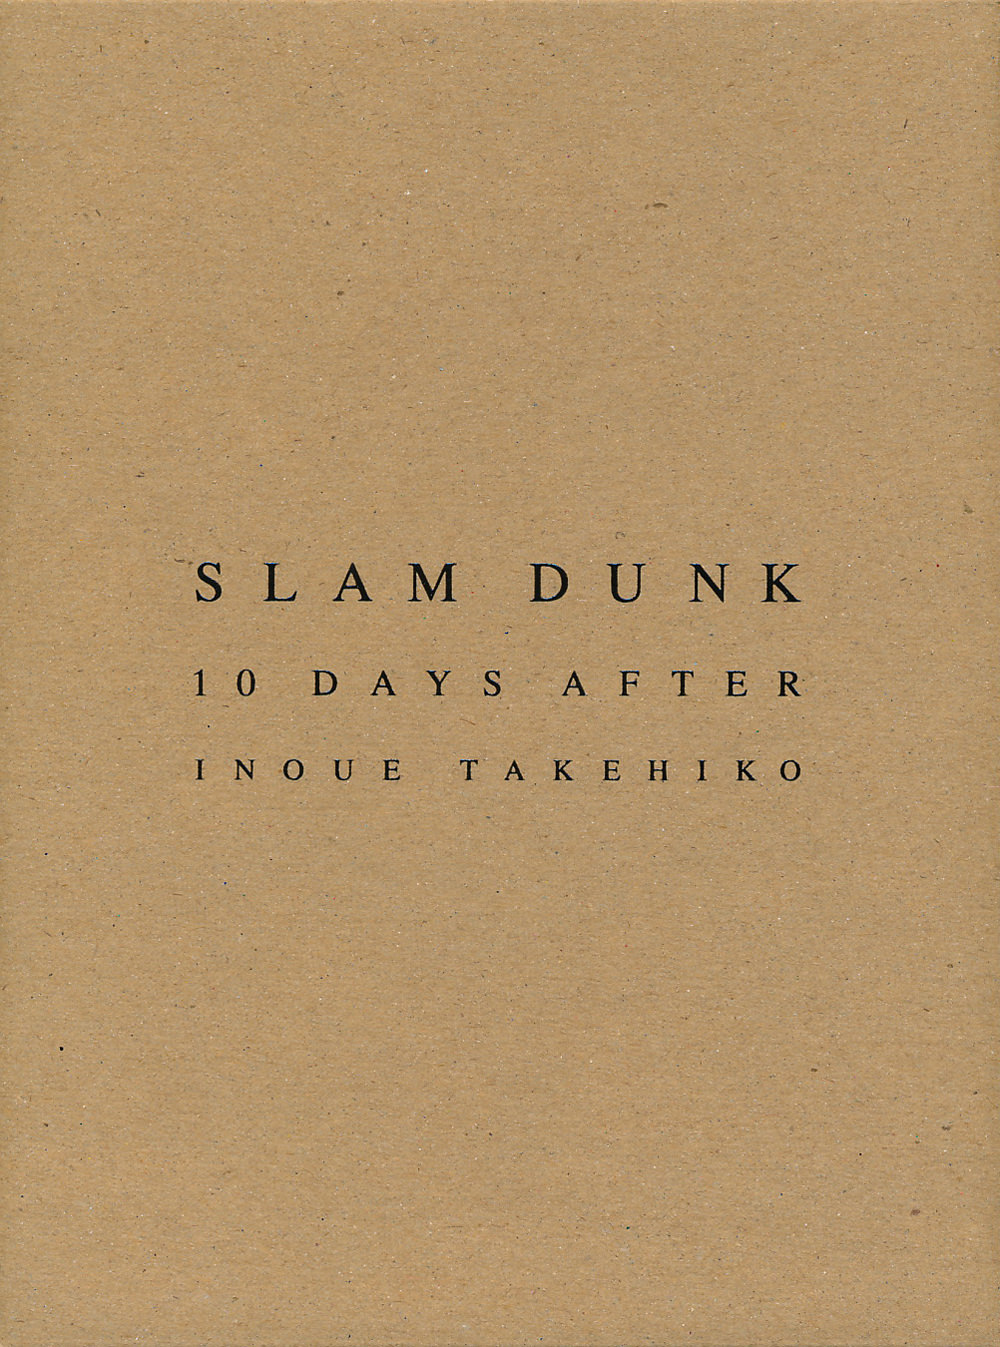 inoue takehiko on the web slam dunk 10 days after